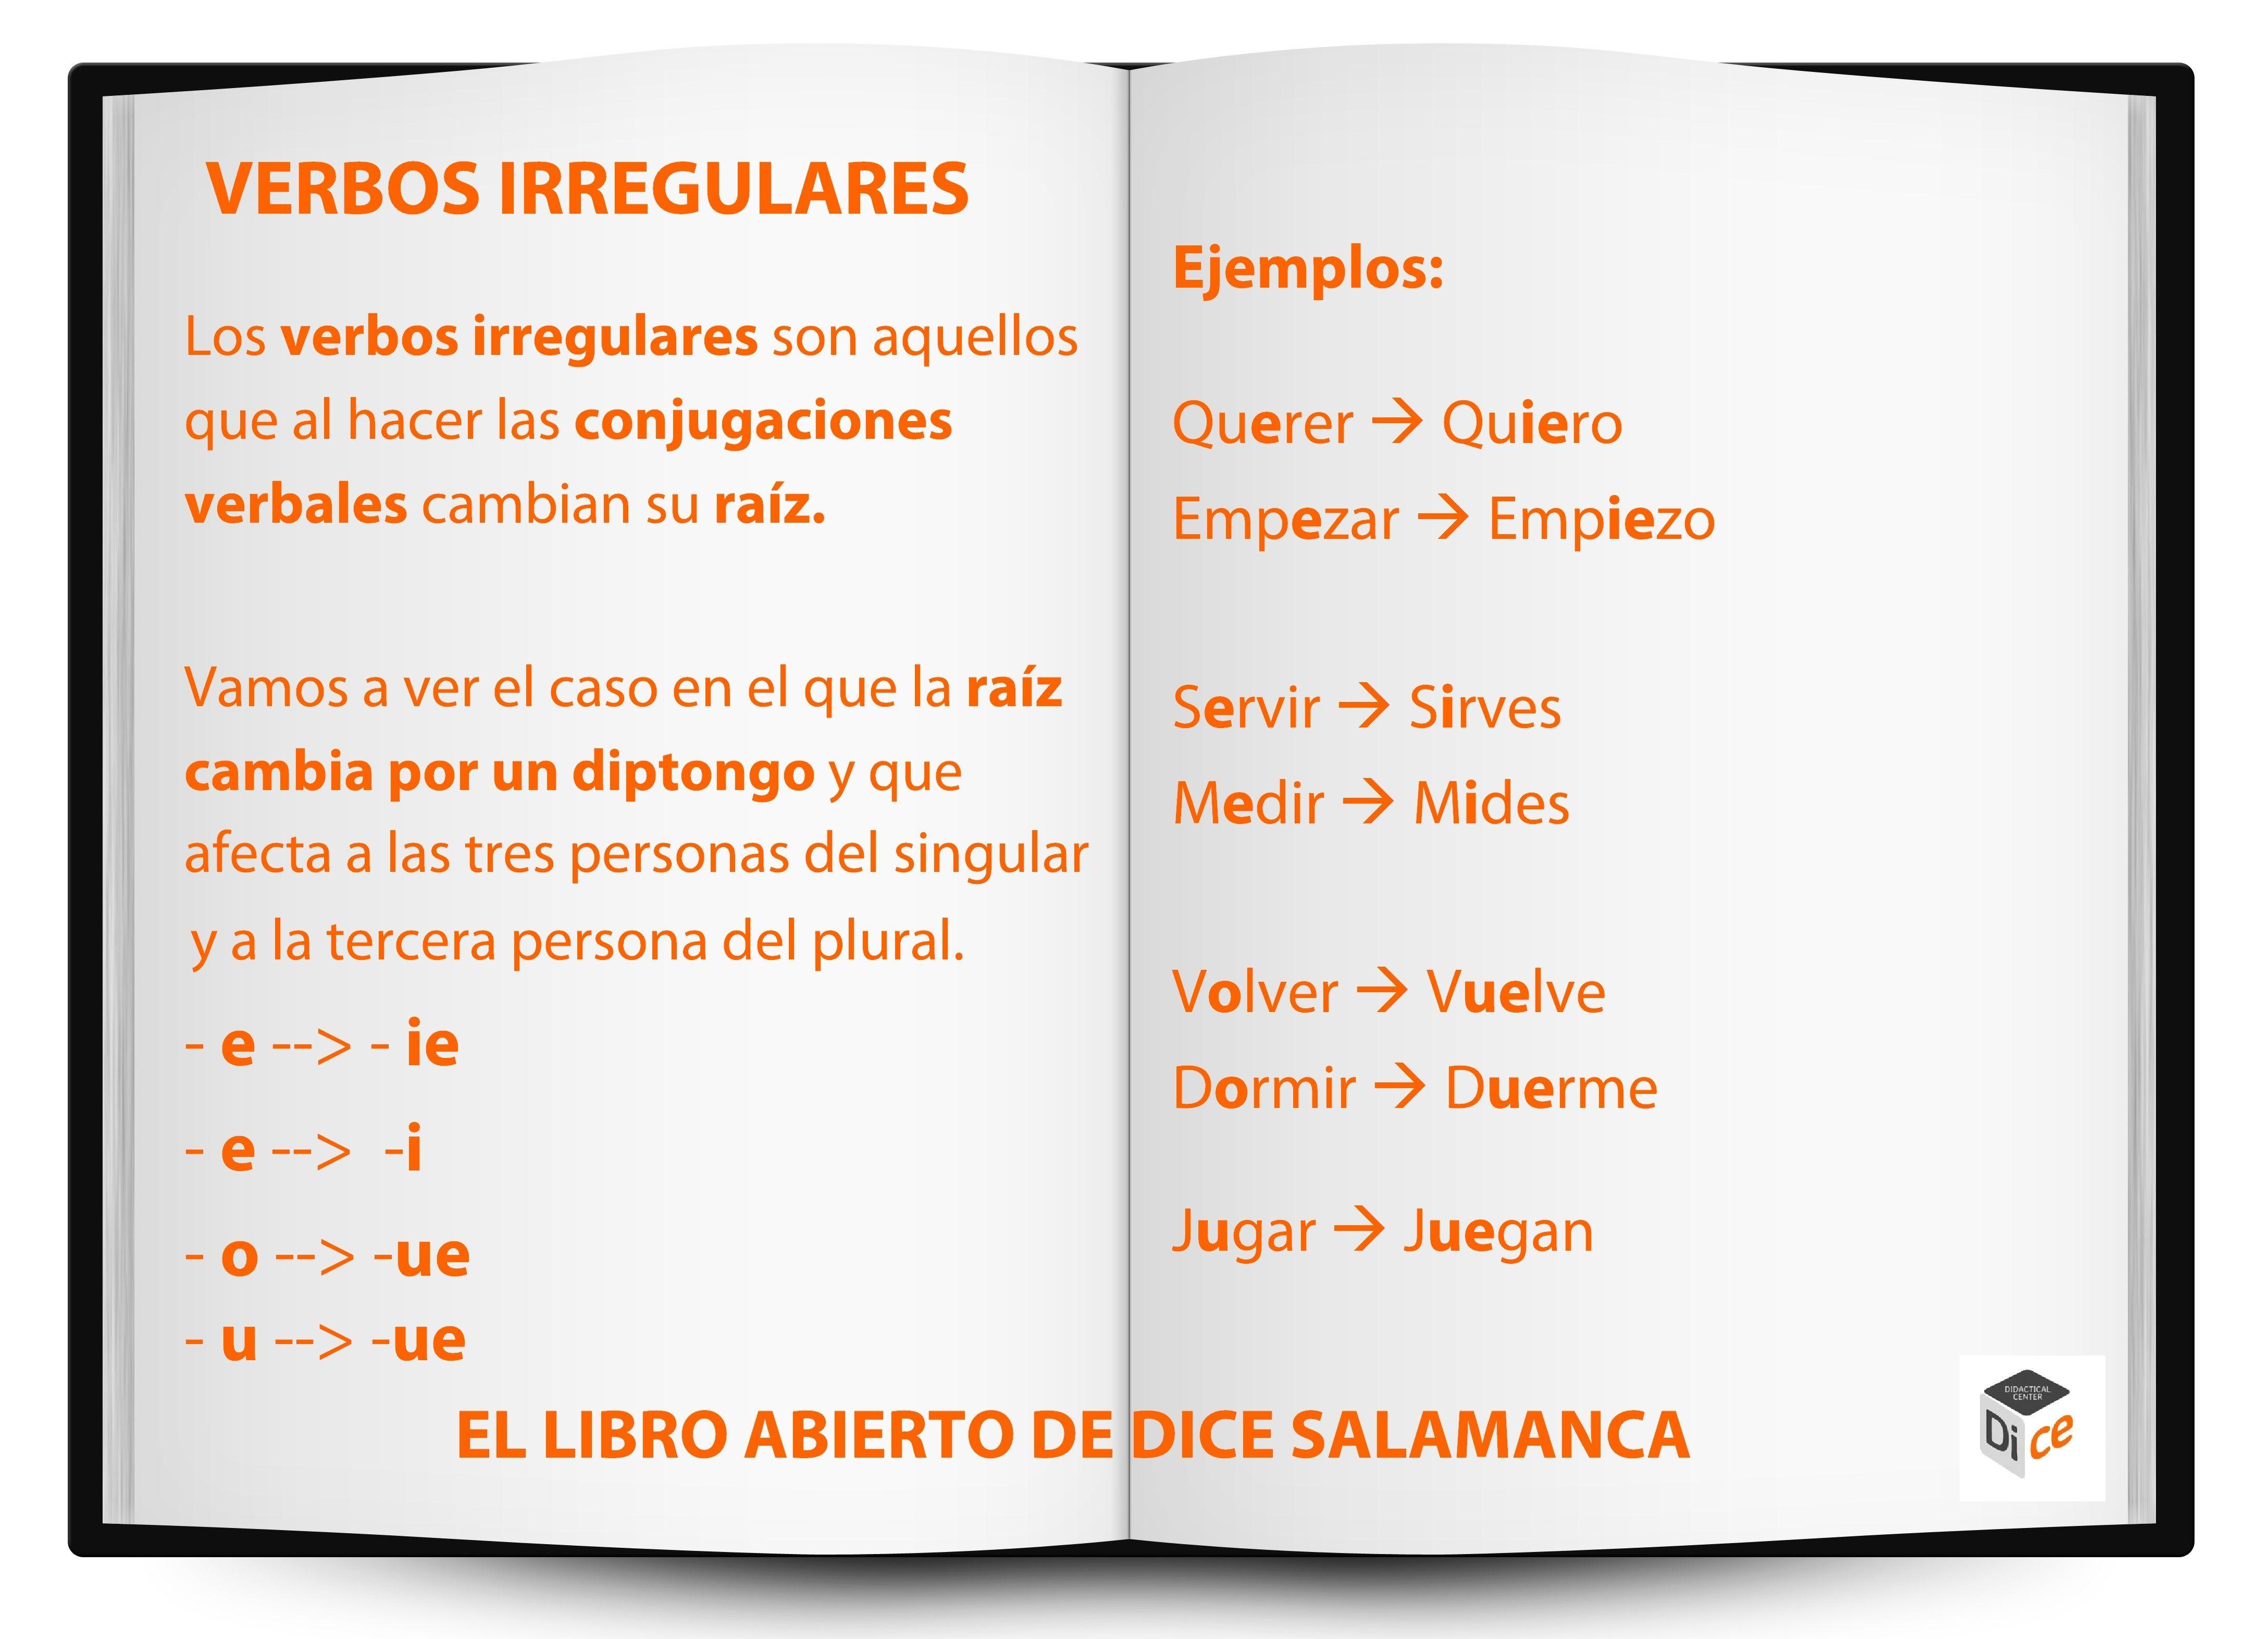 Notes On Verbos Irregulares